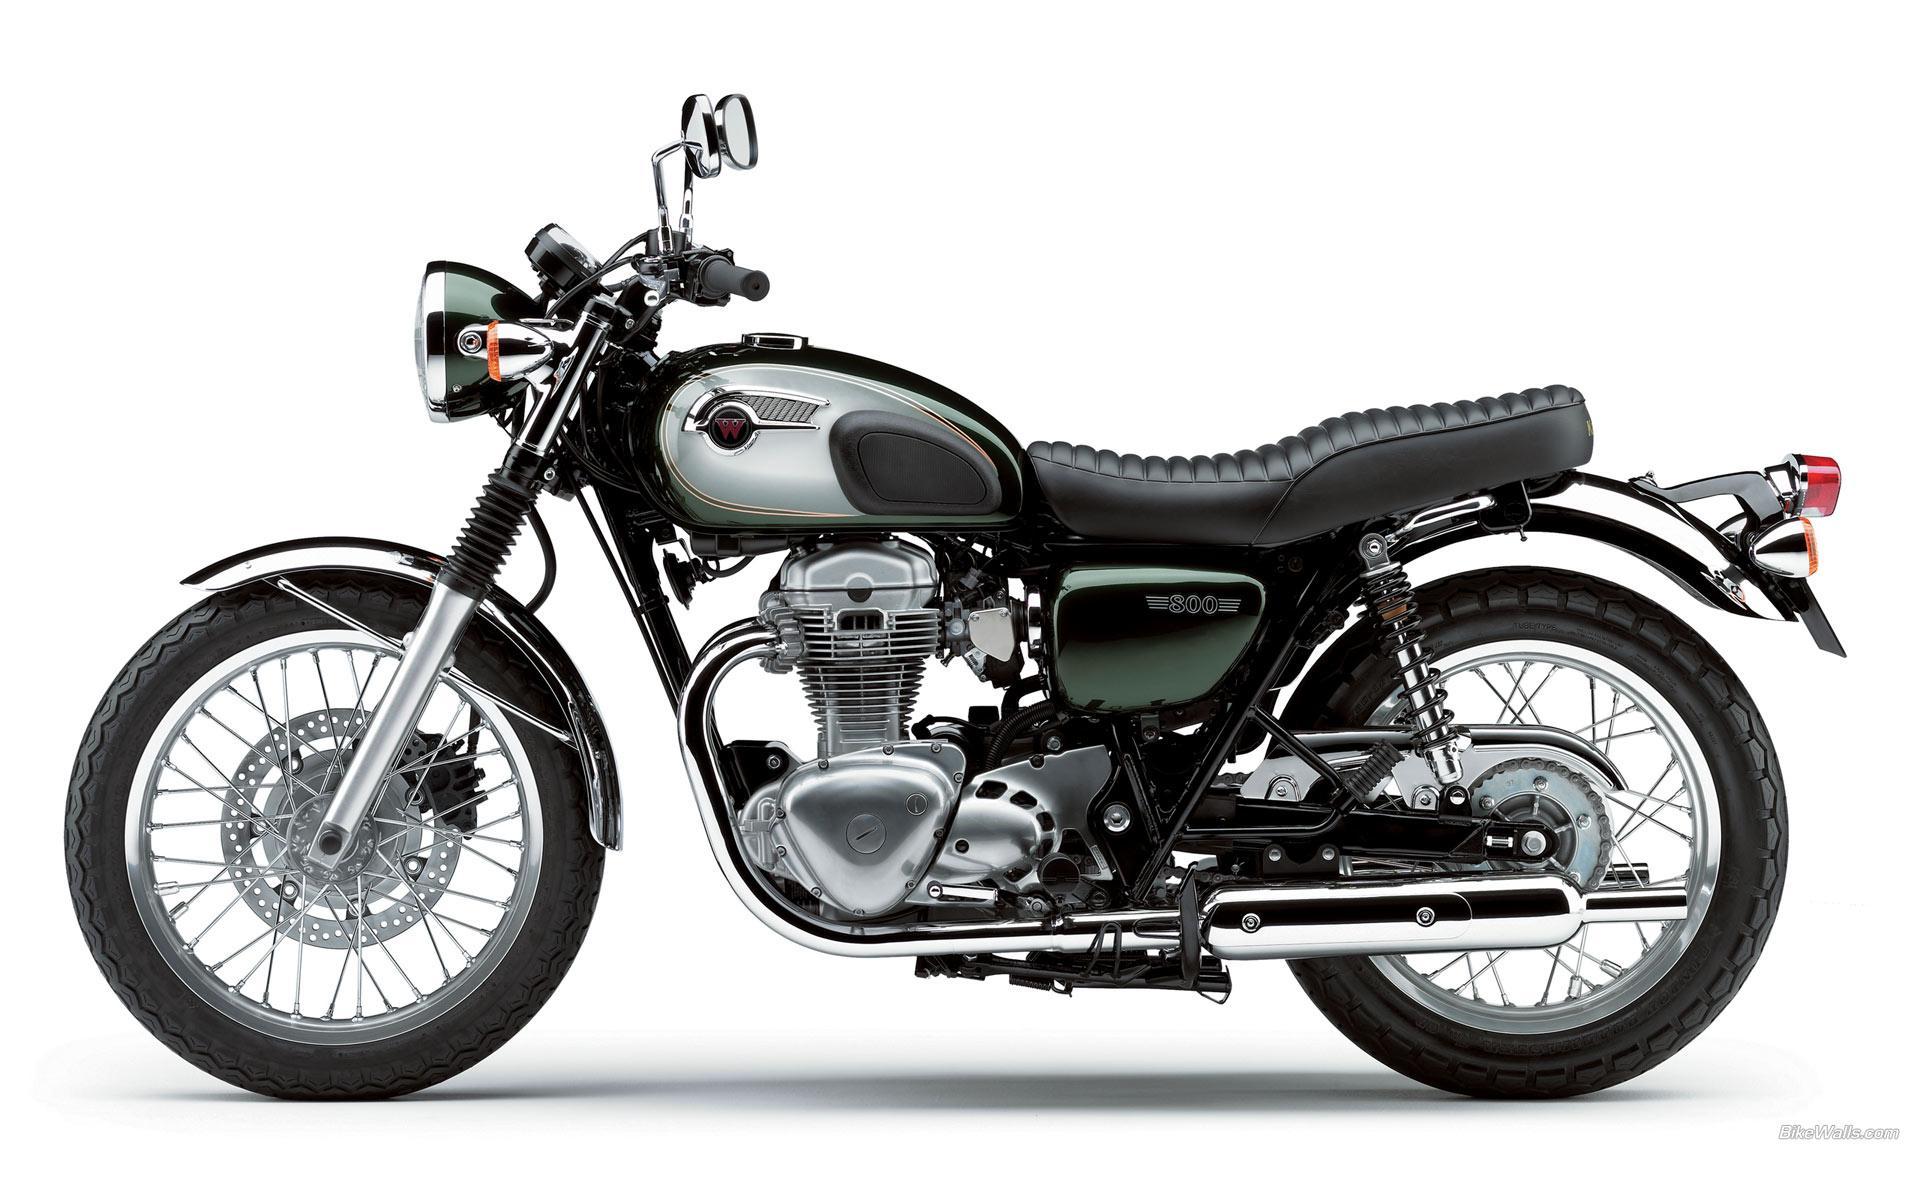 Kawasaki Ninja W800 W800 2011 мото мотоциклы Moto Motorcycle